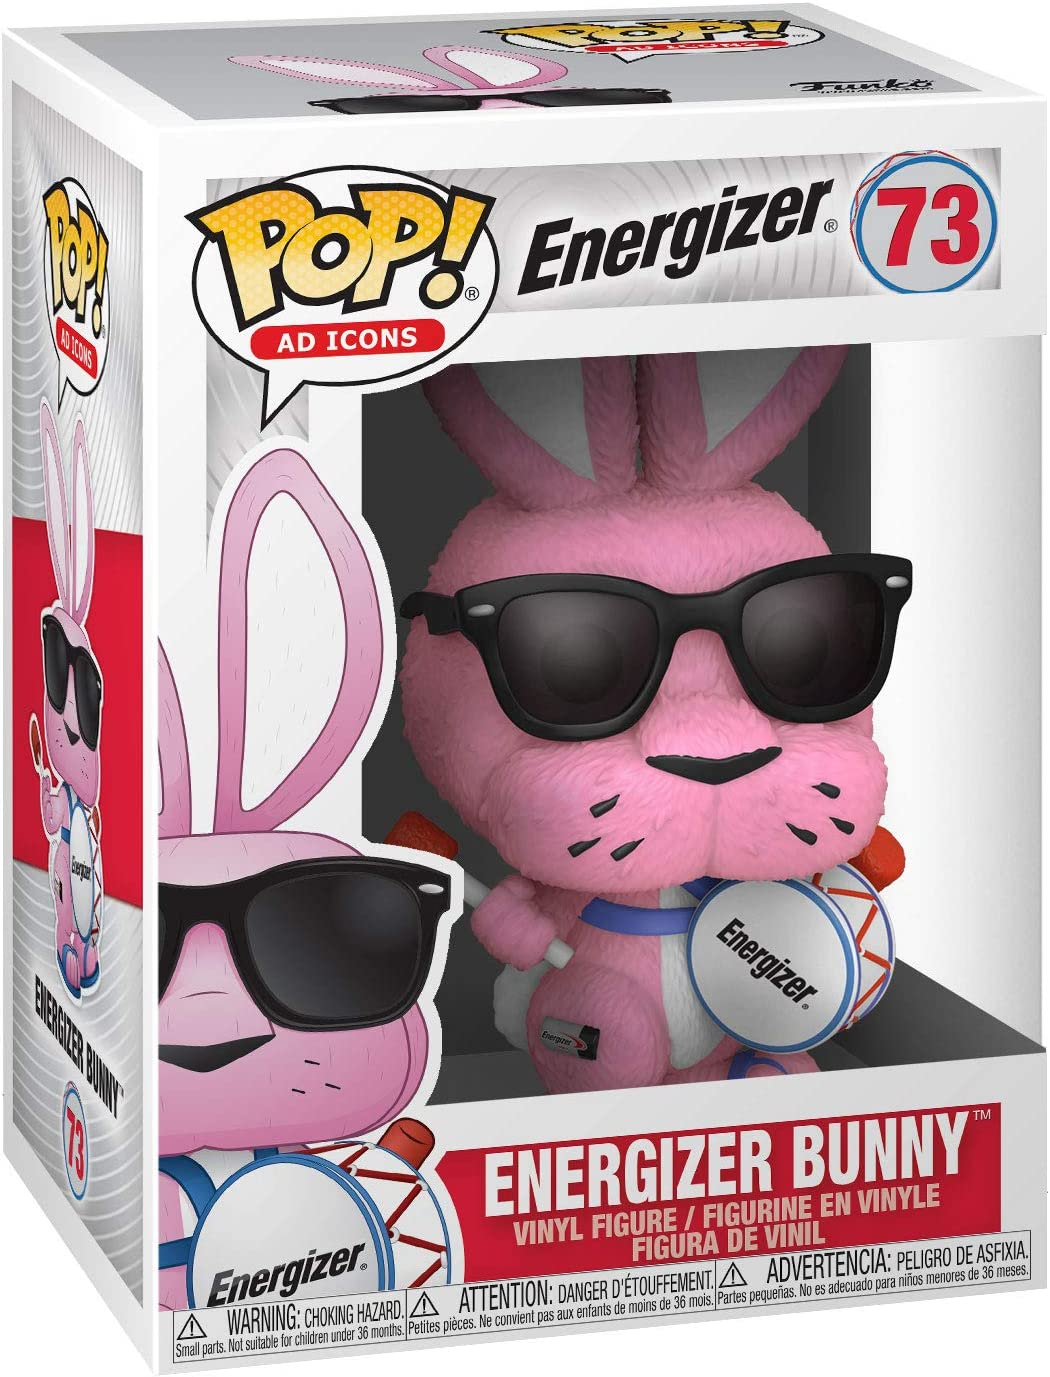 Energizer Bunny with Drum Ad ICON Vinyl POP Figure Toy #73 FUNKO NEW MIB